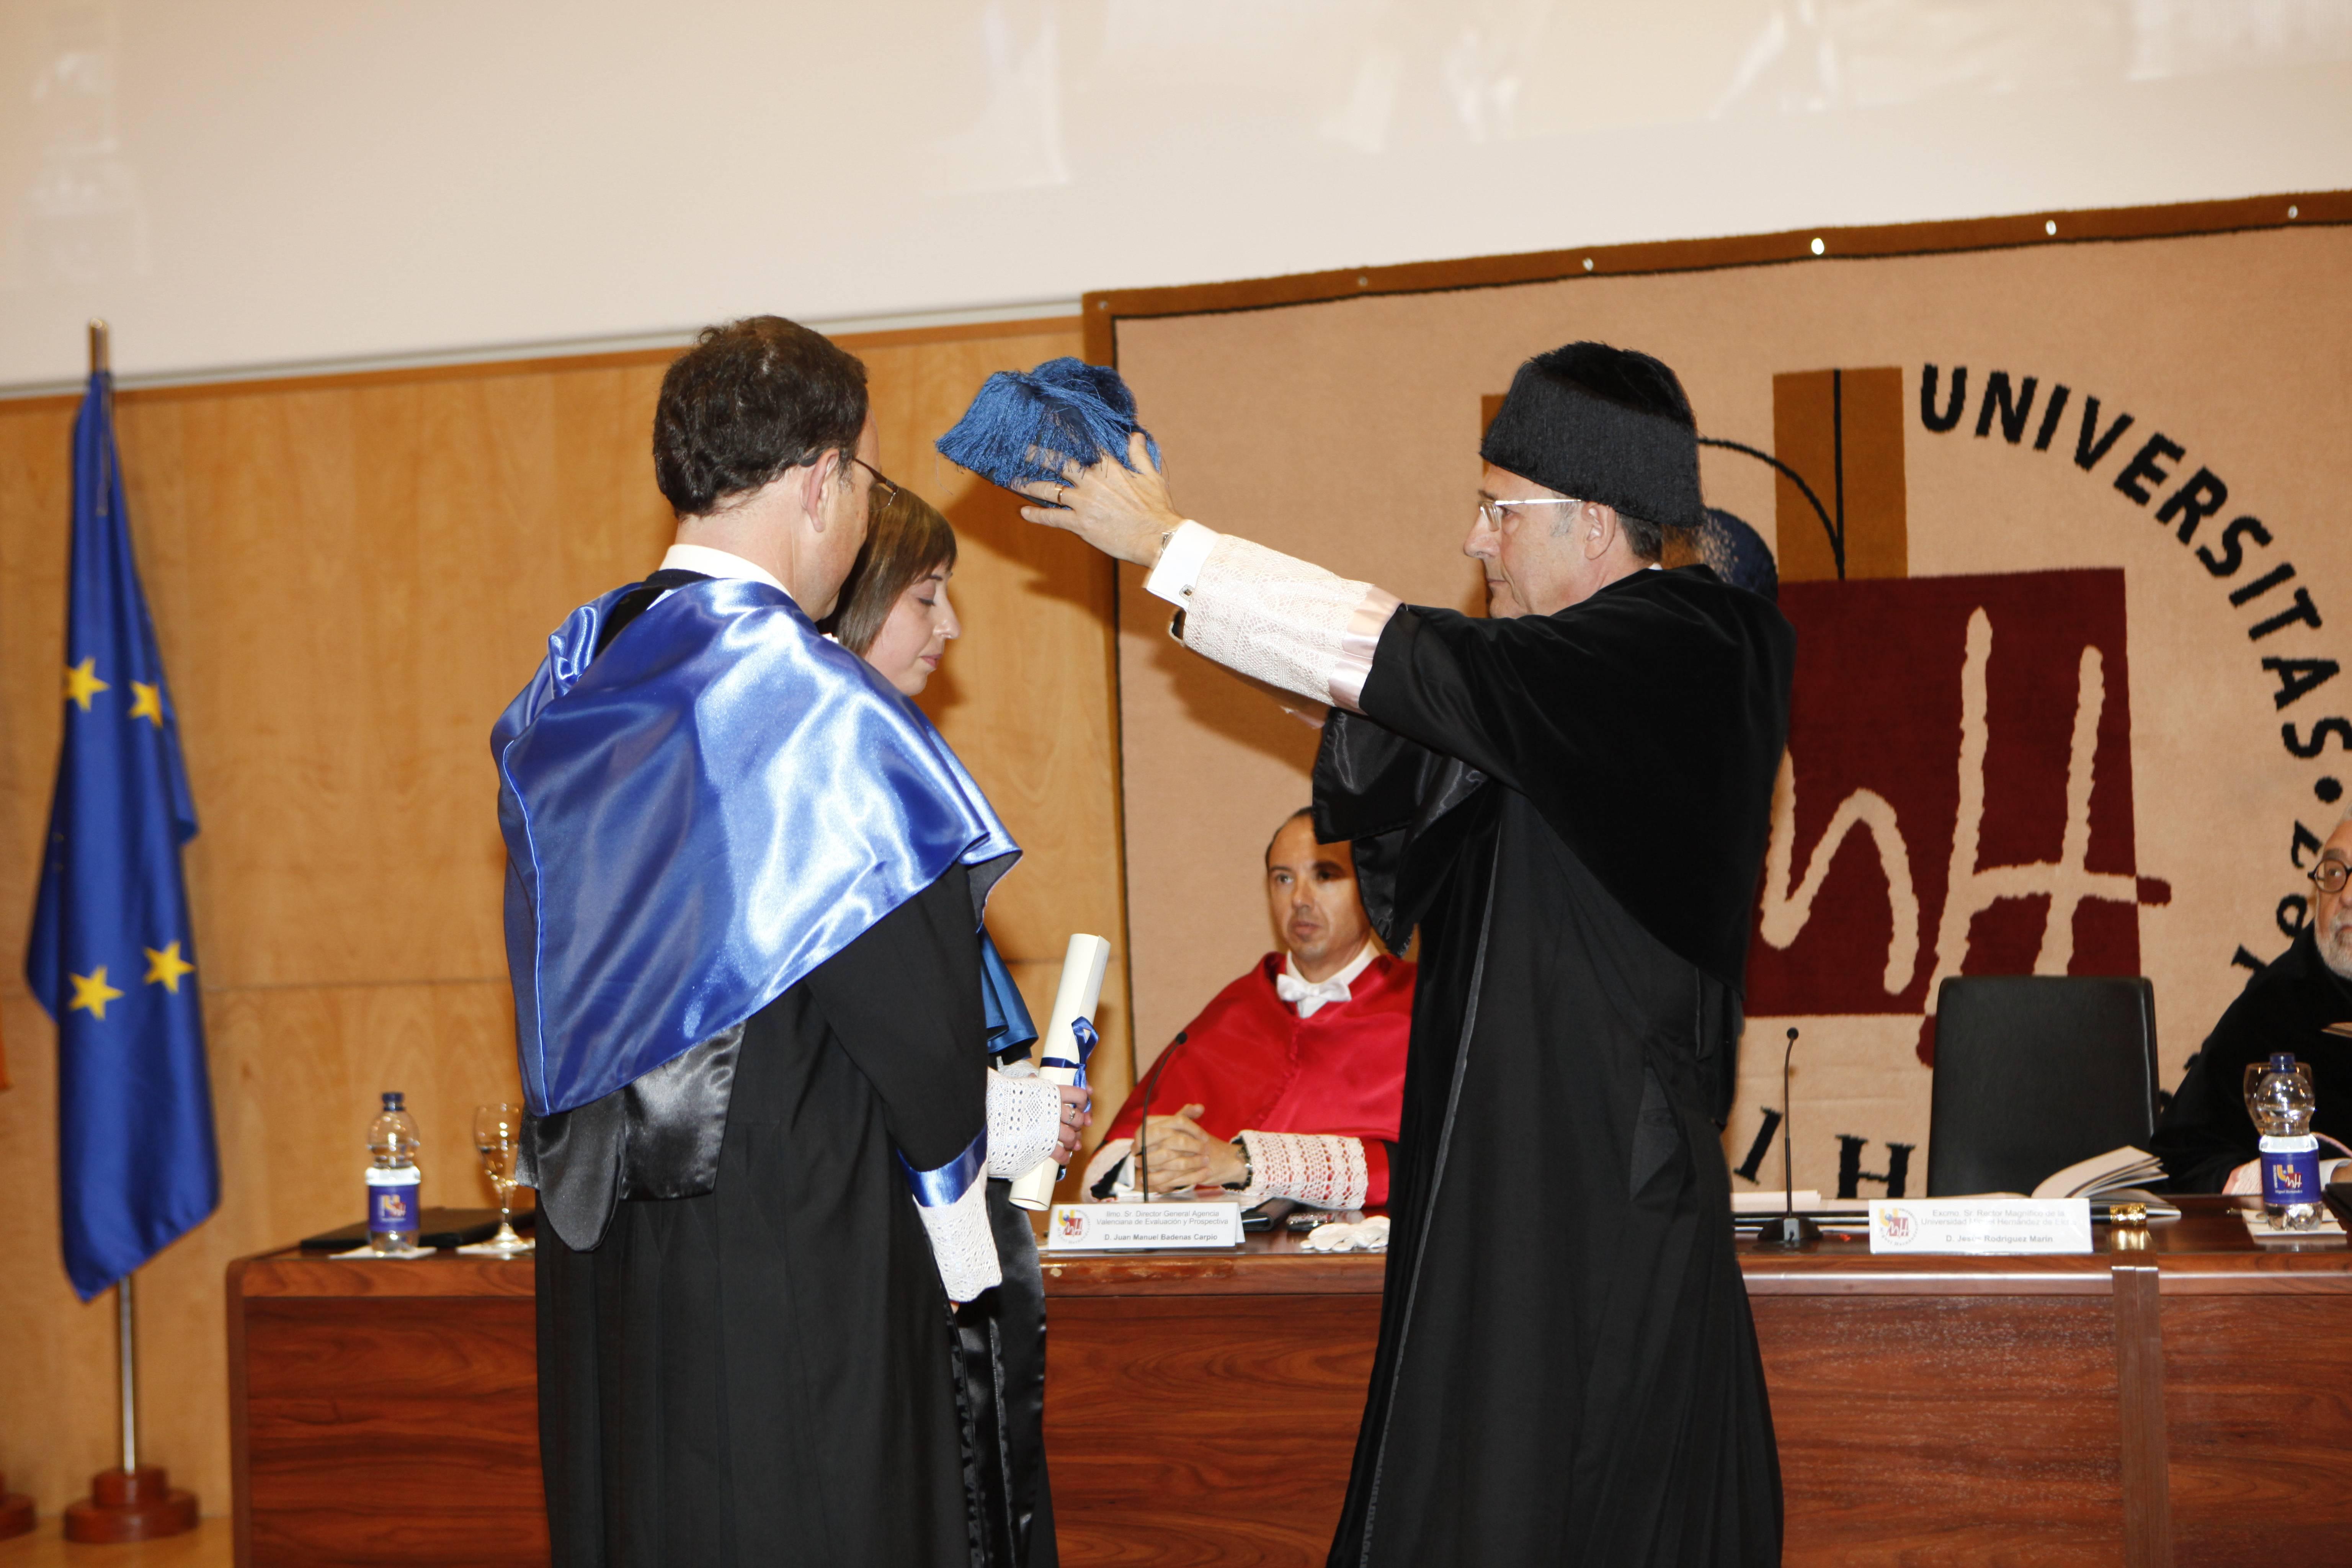 doctor-honoris-causa-luis-gamir_mg_1087.jpg